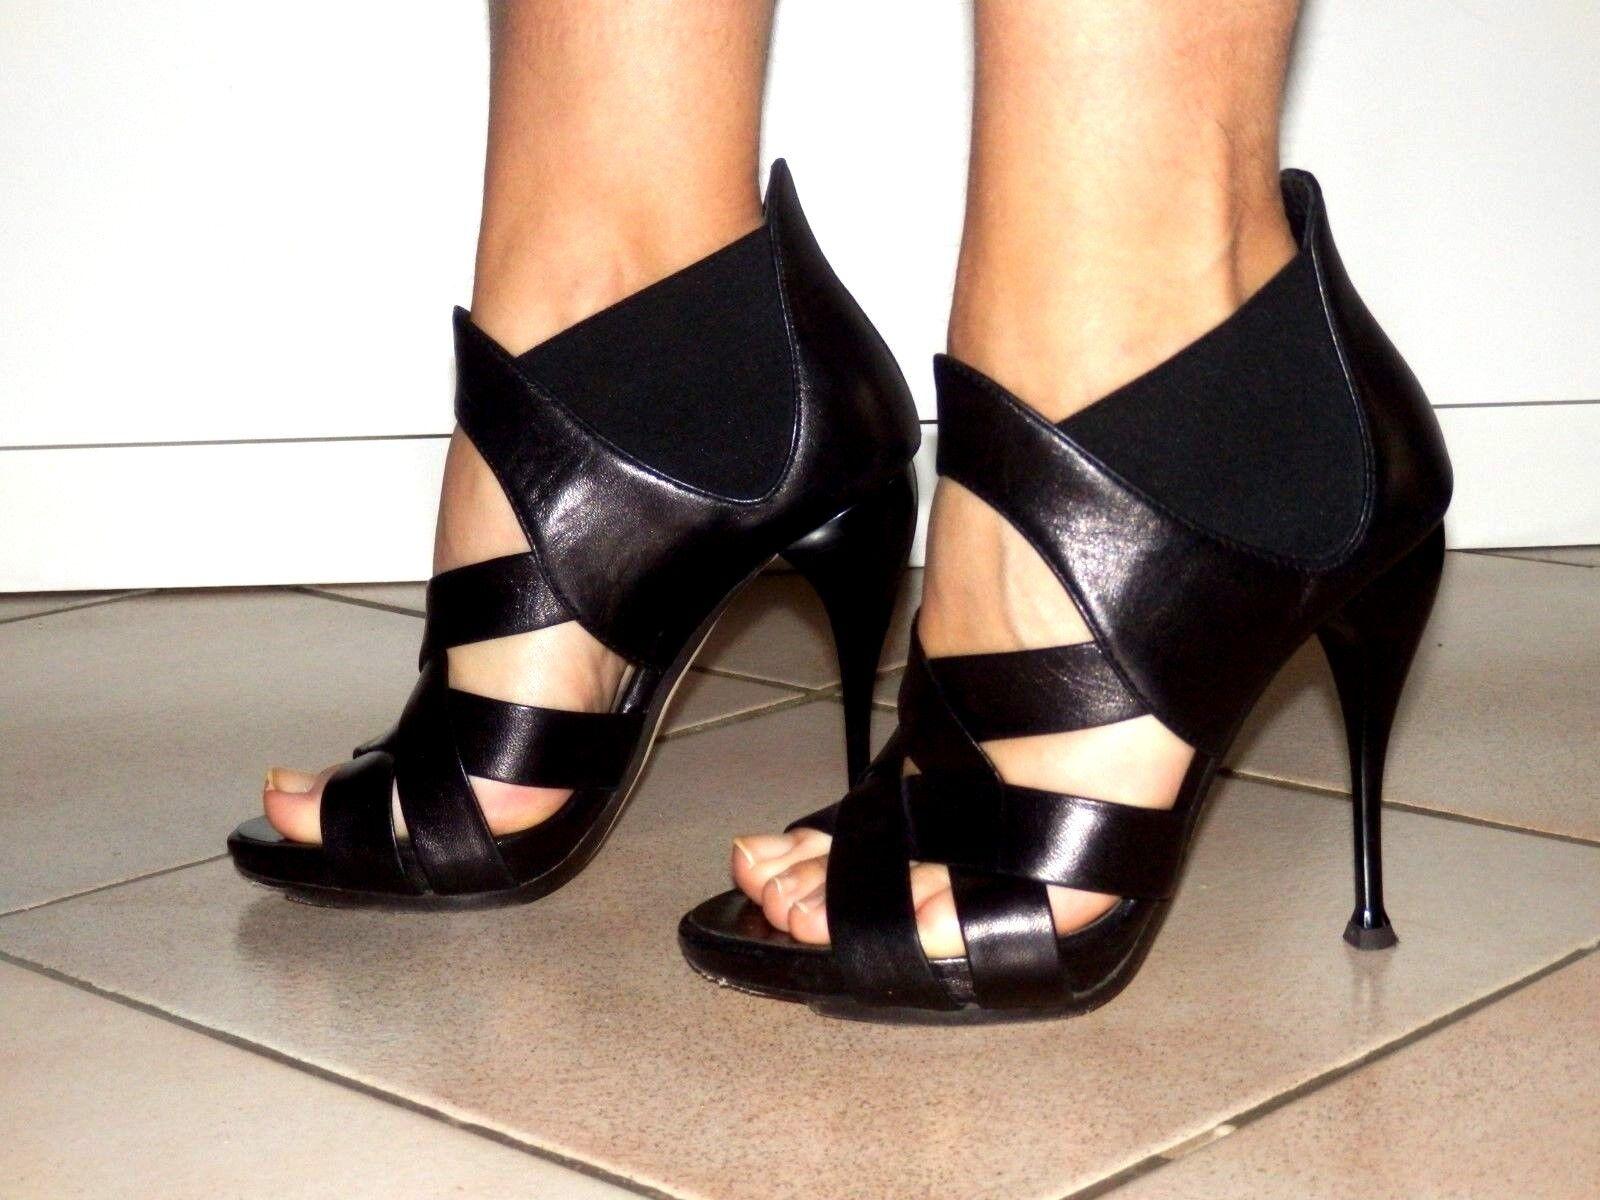 Giuseppe Zanotti Court shoes - shoes - Size 35.5 - Authentic